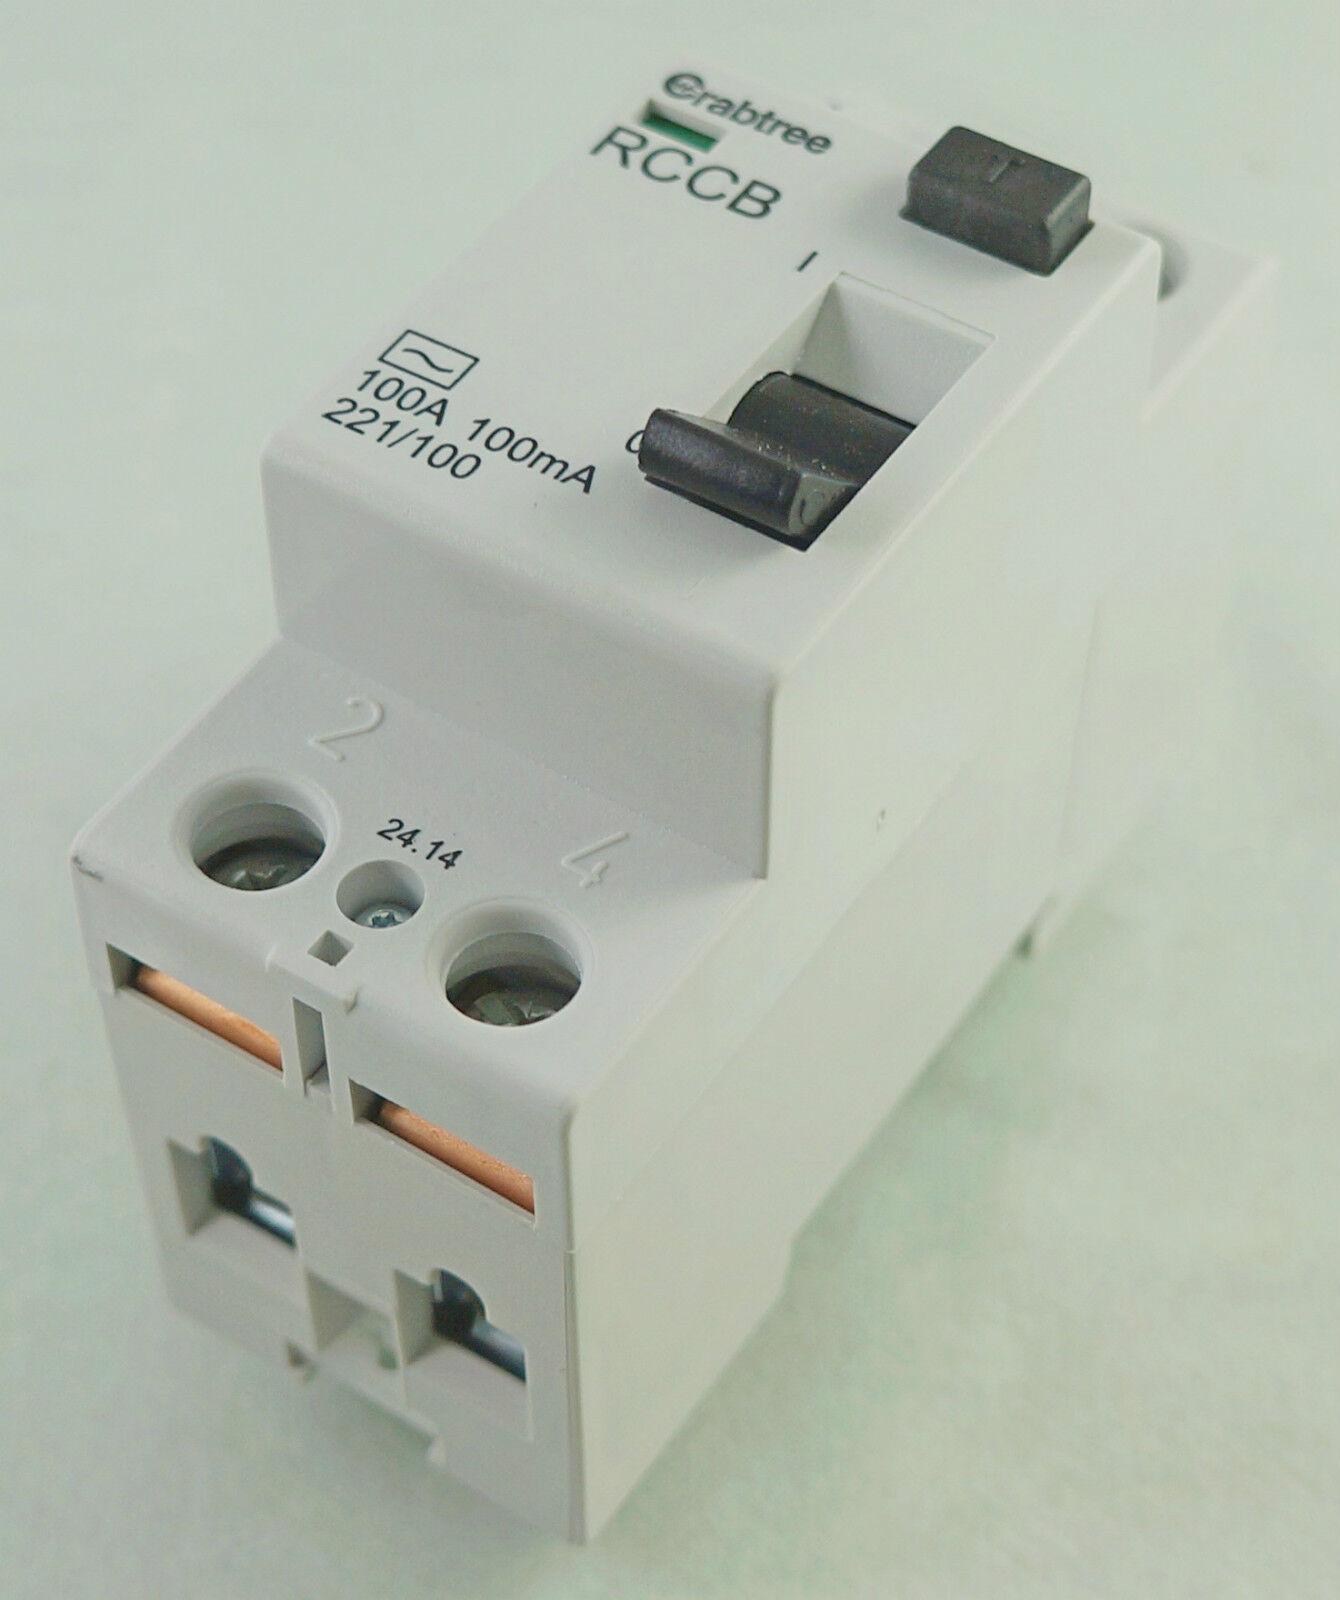 Lifestar 100A 100mA 2 Pole RCCB DP Residual Current Circuit Breaker 230V 221//100